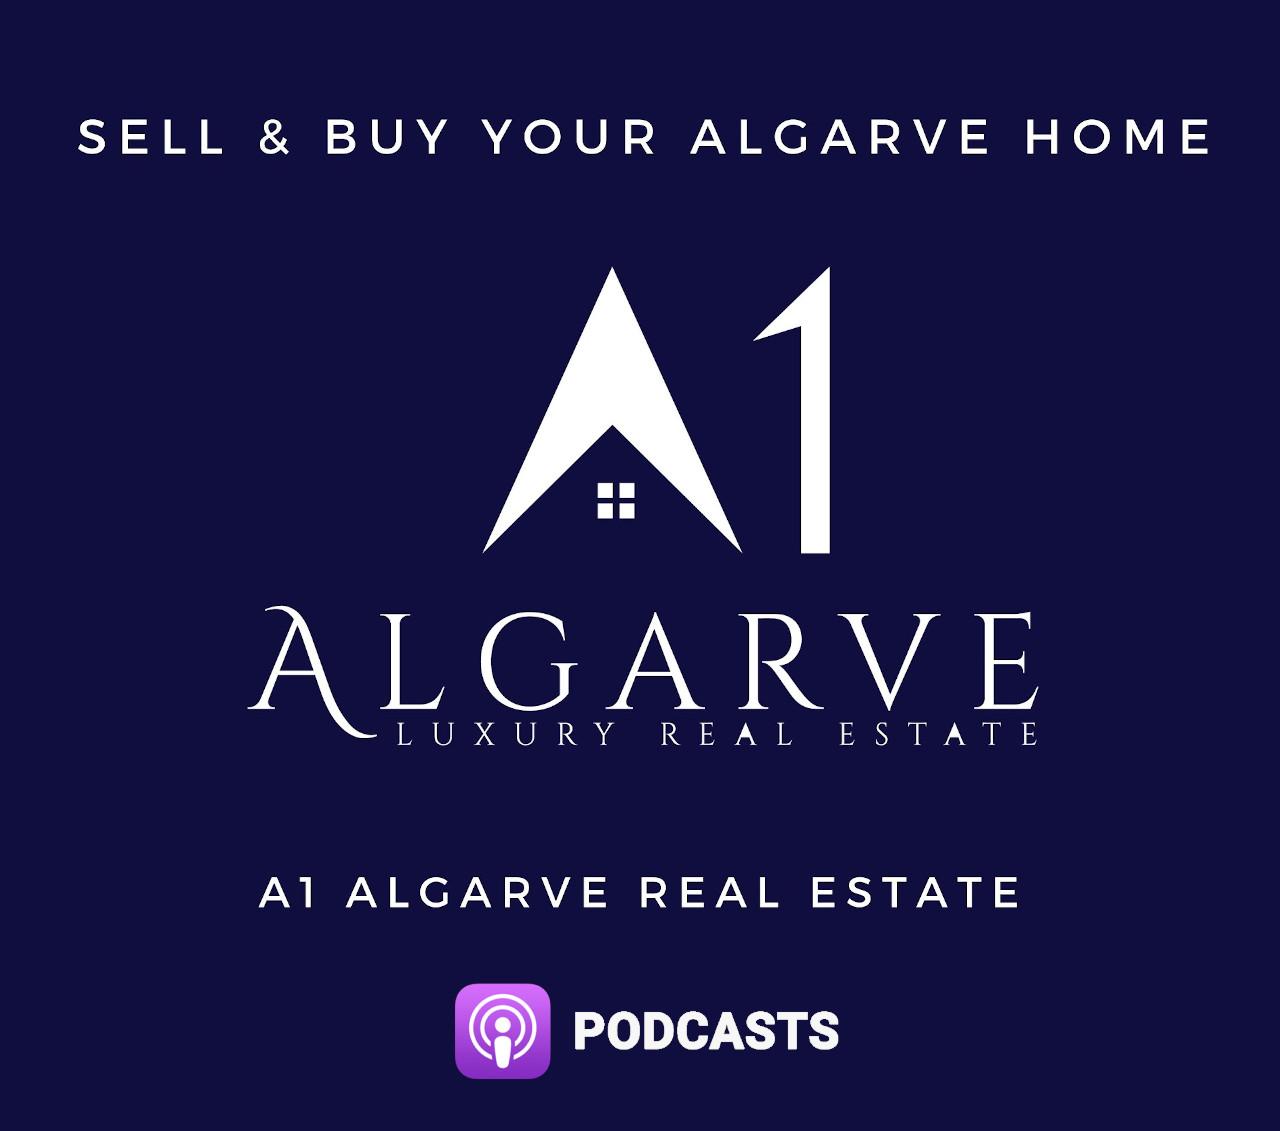 A1 Algarve Real Estate Podcasts